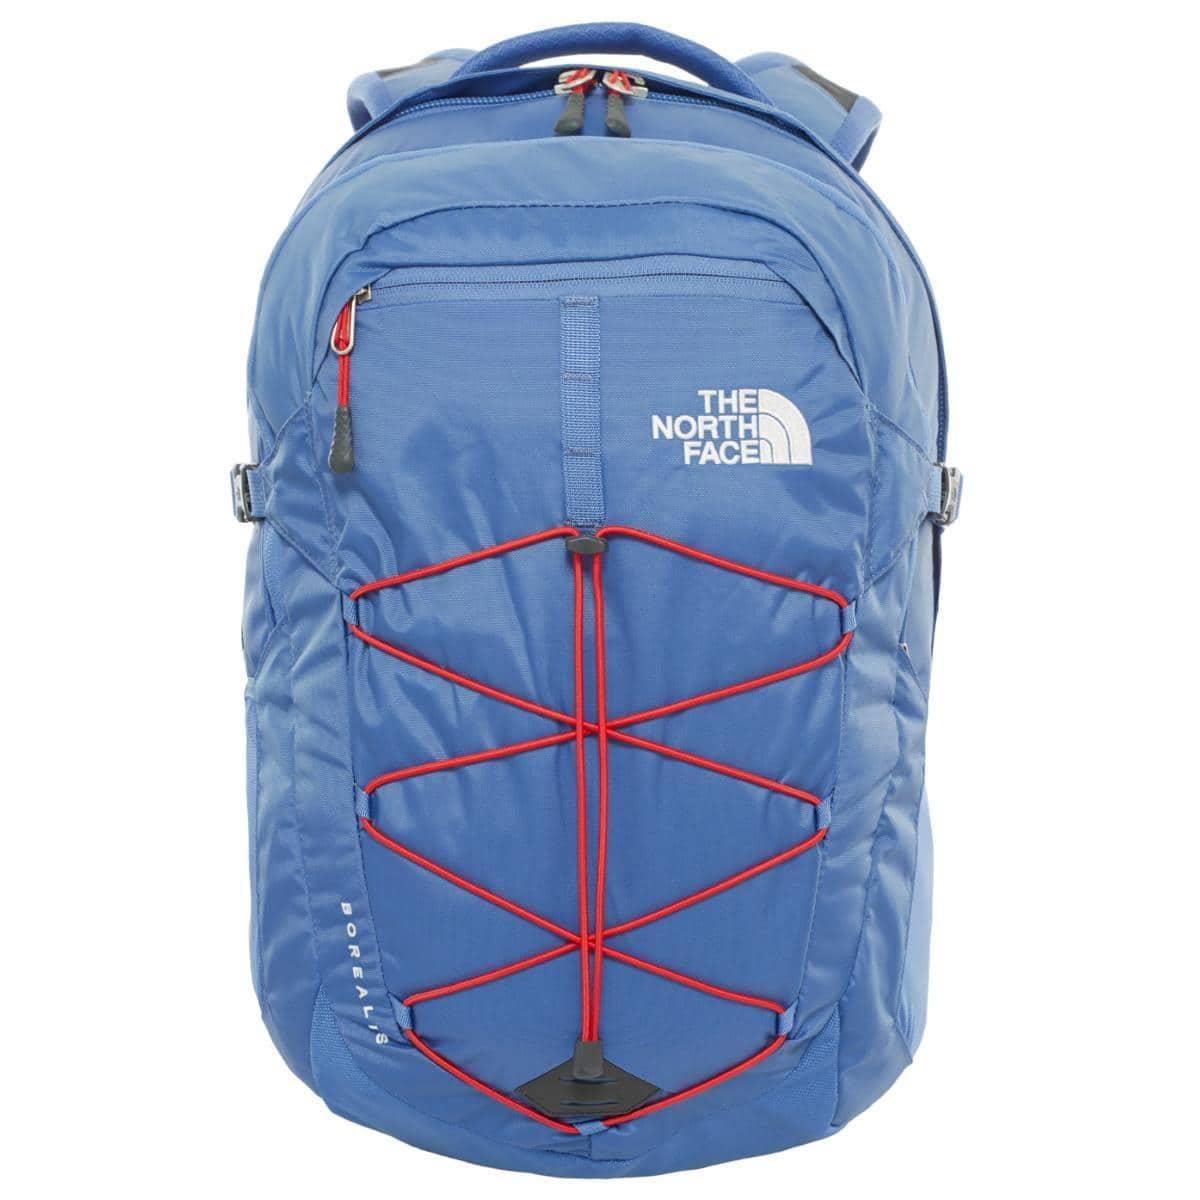 7b333aa8c4 North Face Backpack Light Blue- Fenix Toulouse Handball